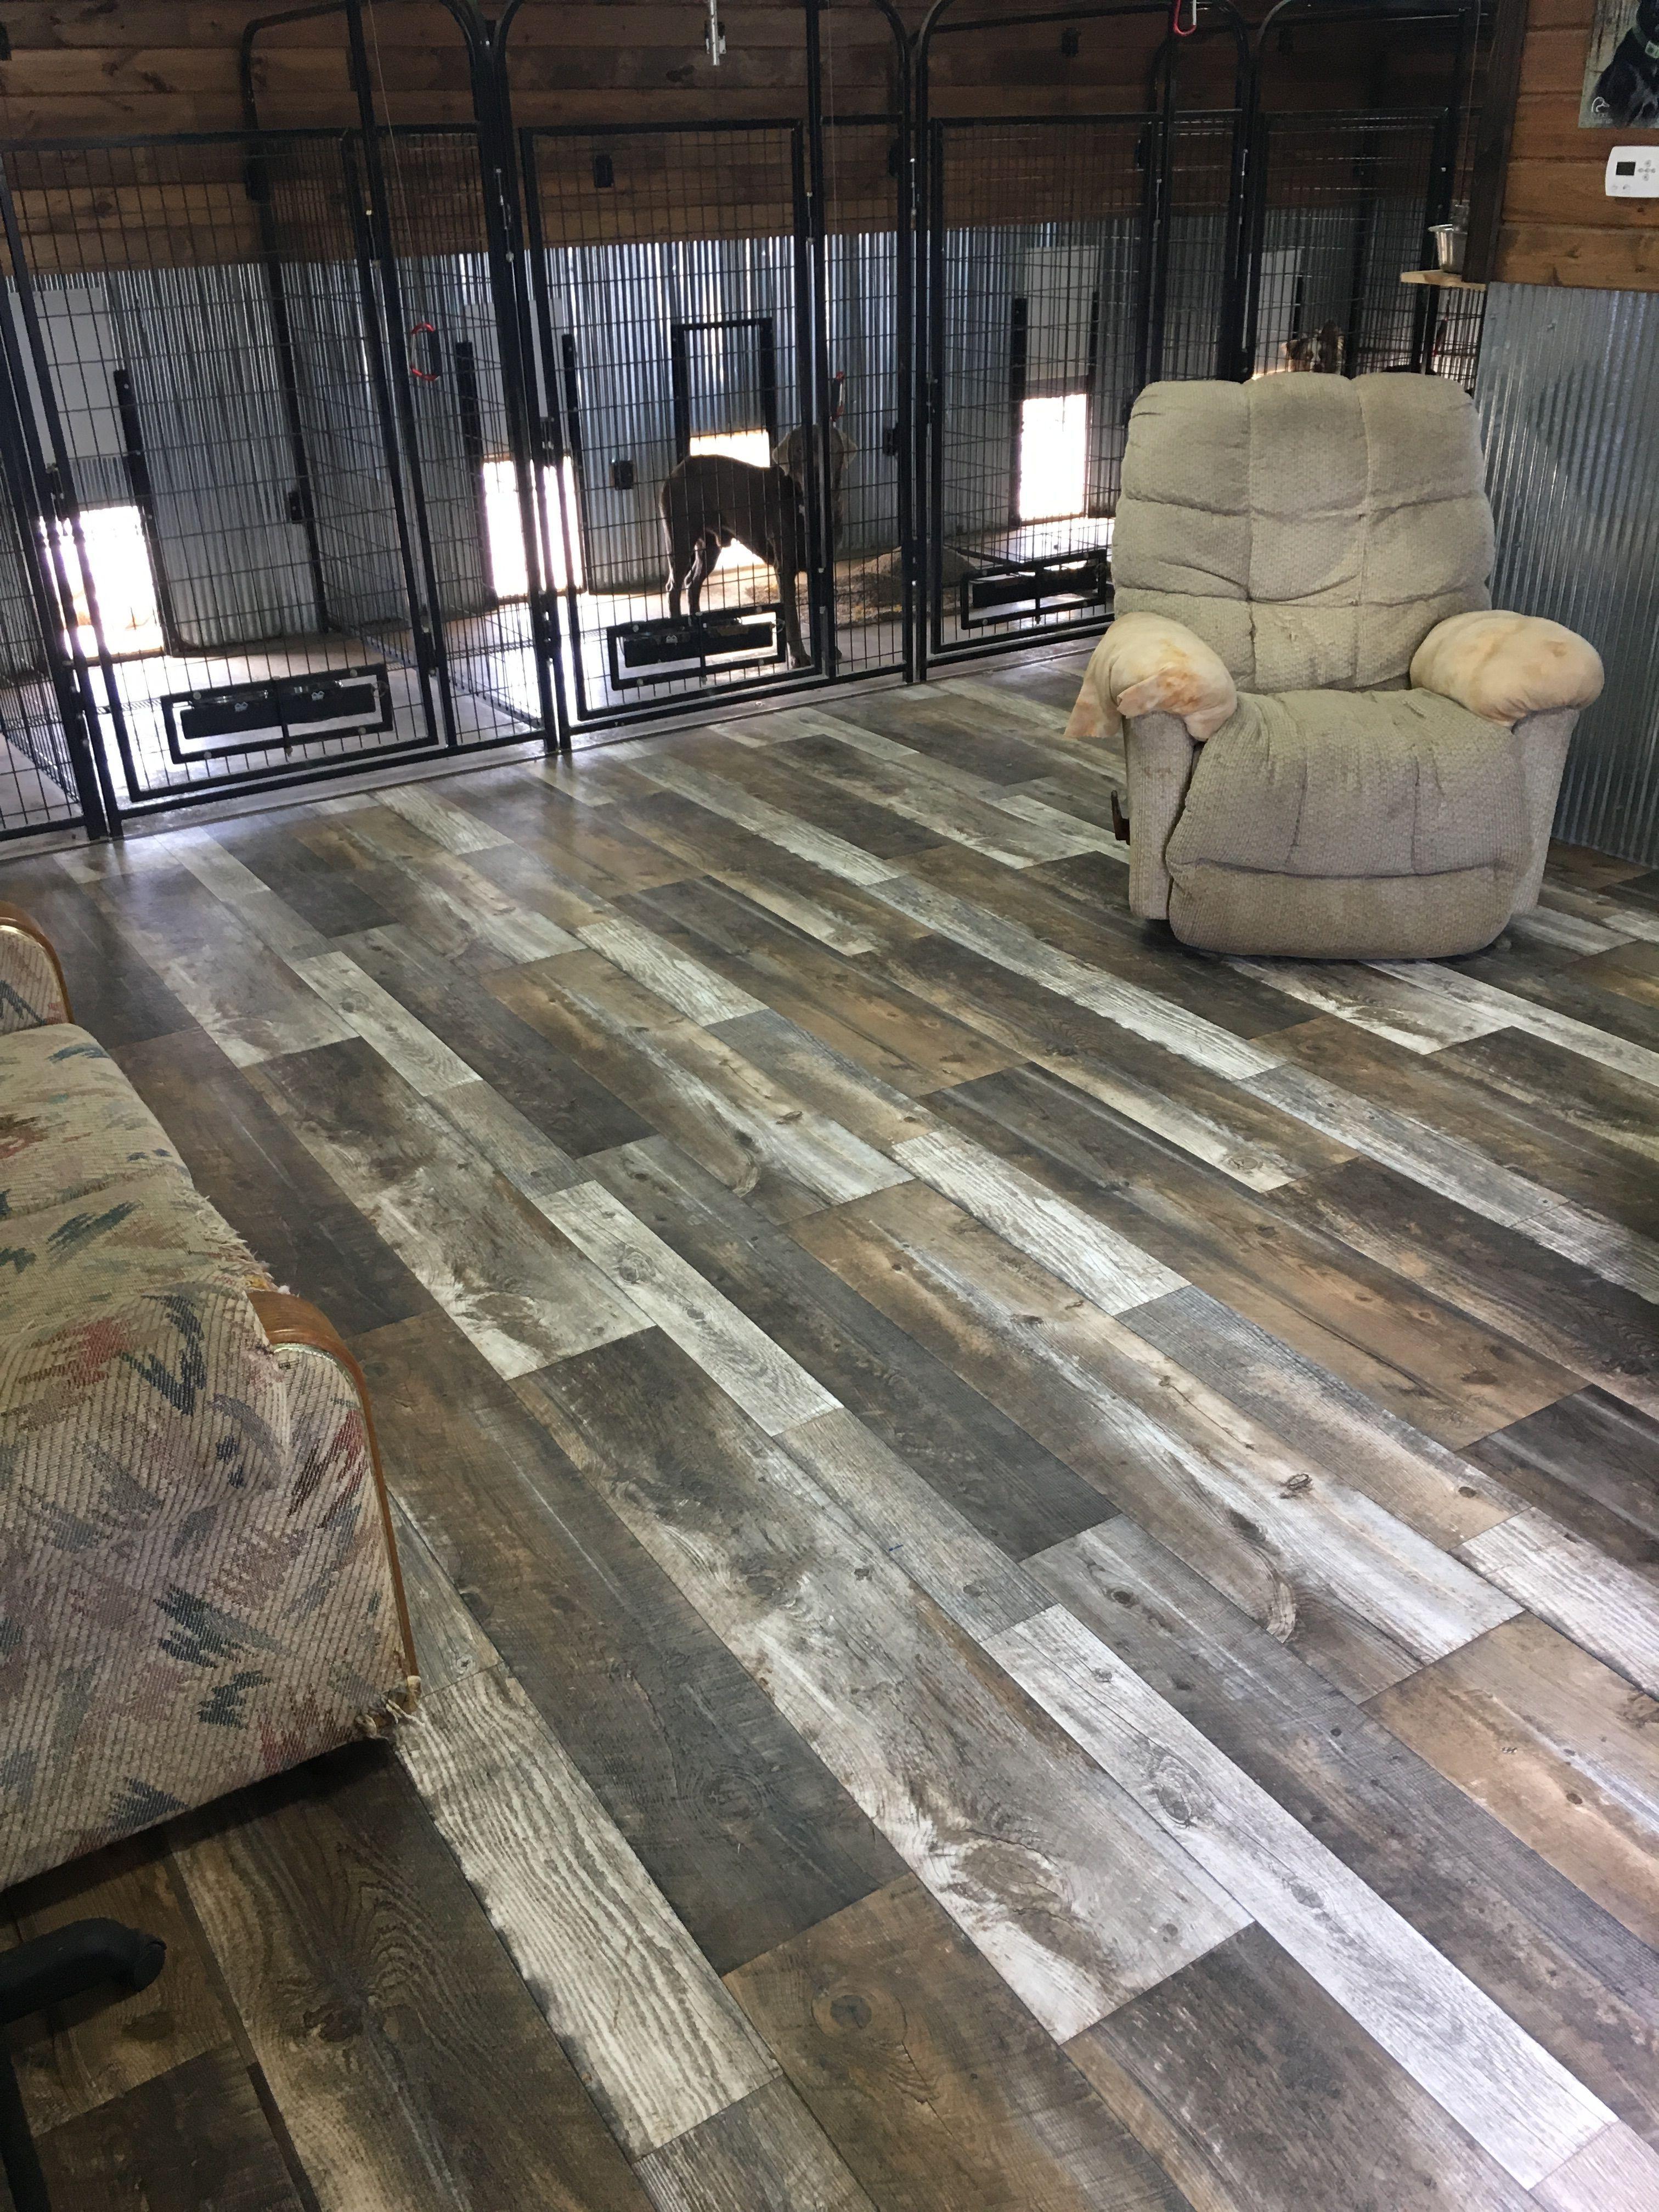 Great Lakes Floors Quest vinyl plank flooring is an